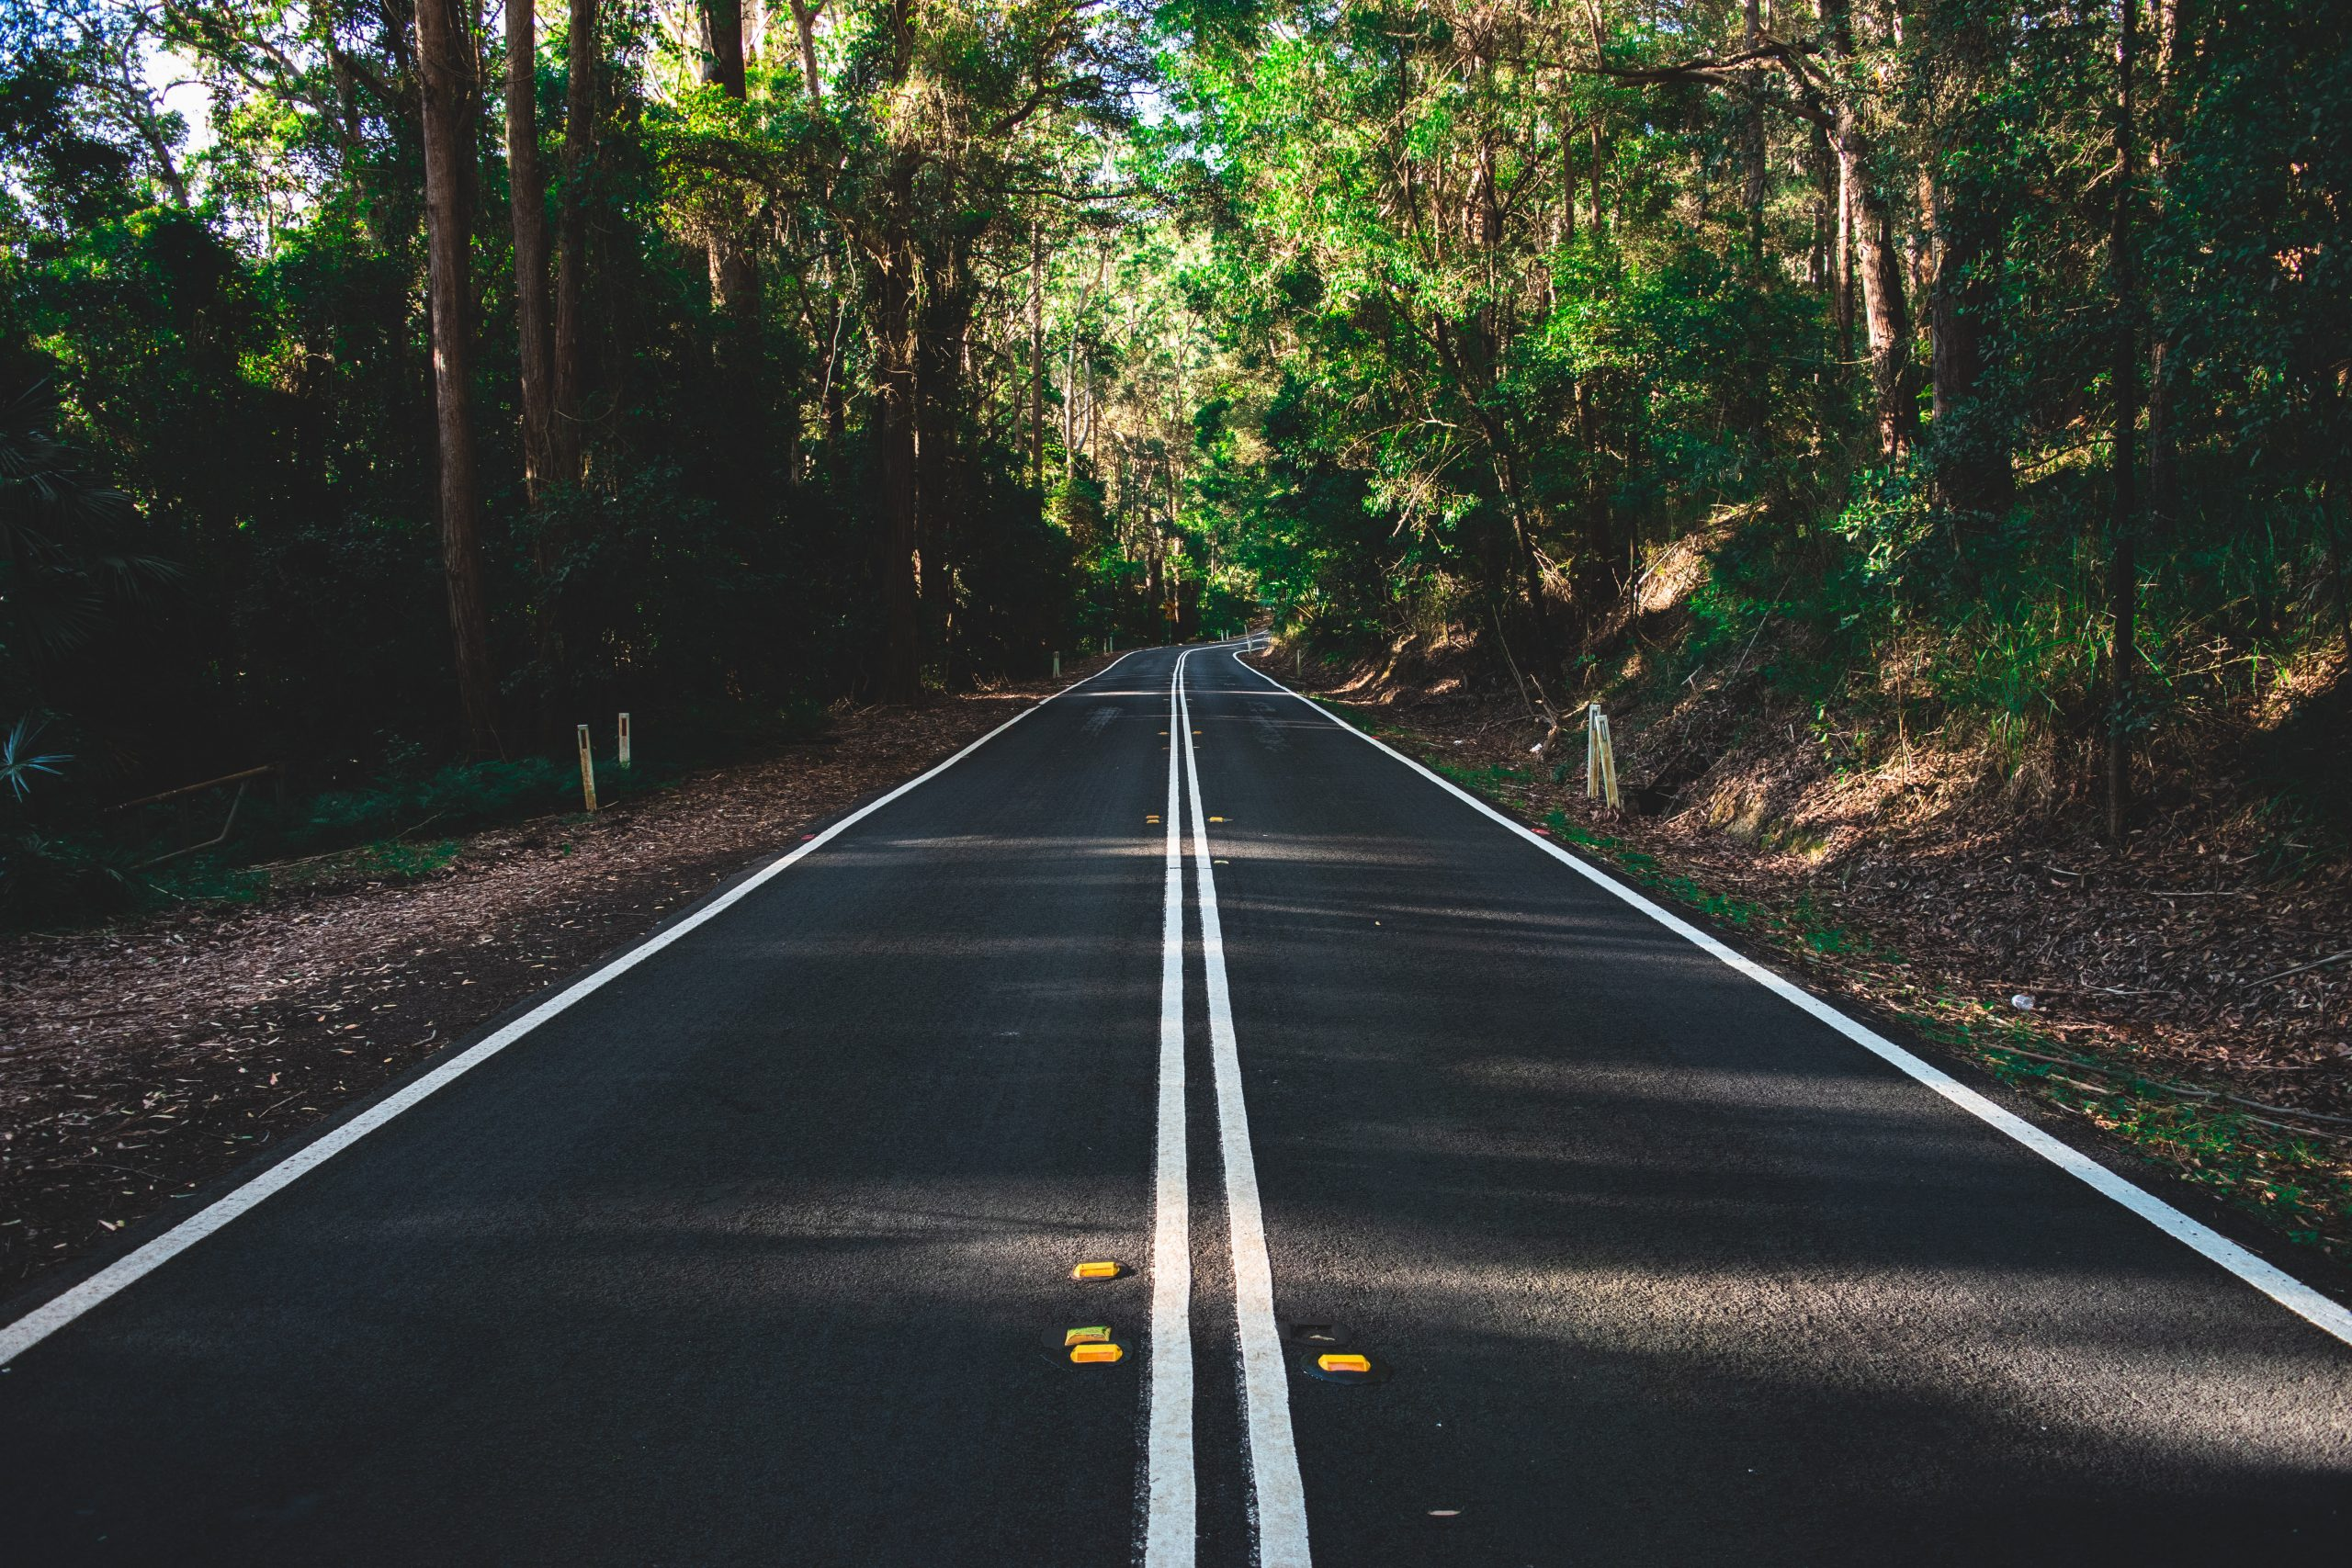 pinturas reflectantes de carretera